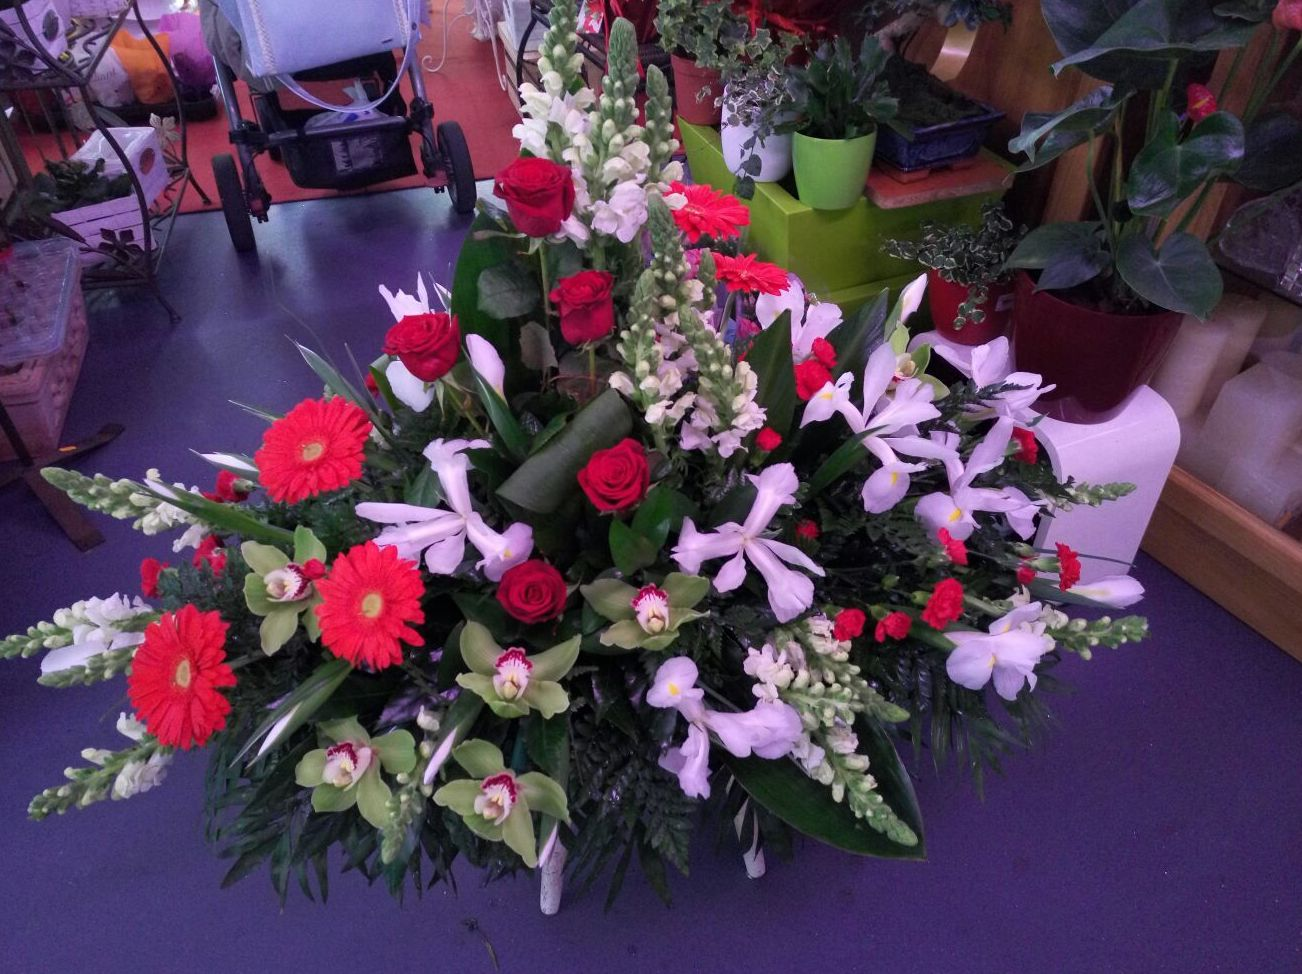 Arreglos florales A Coruña. Mandrágora Floristería